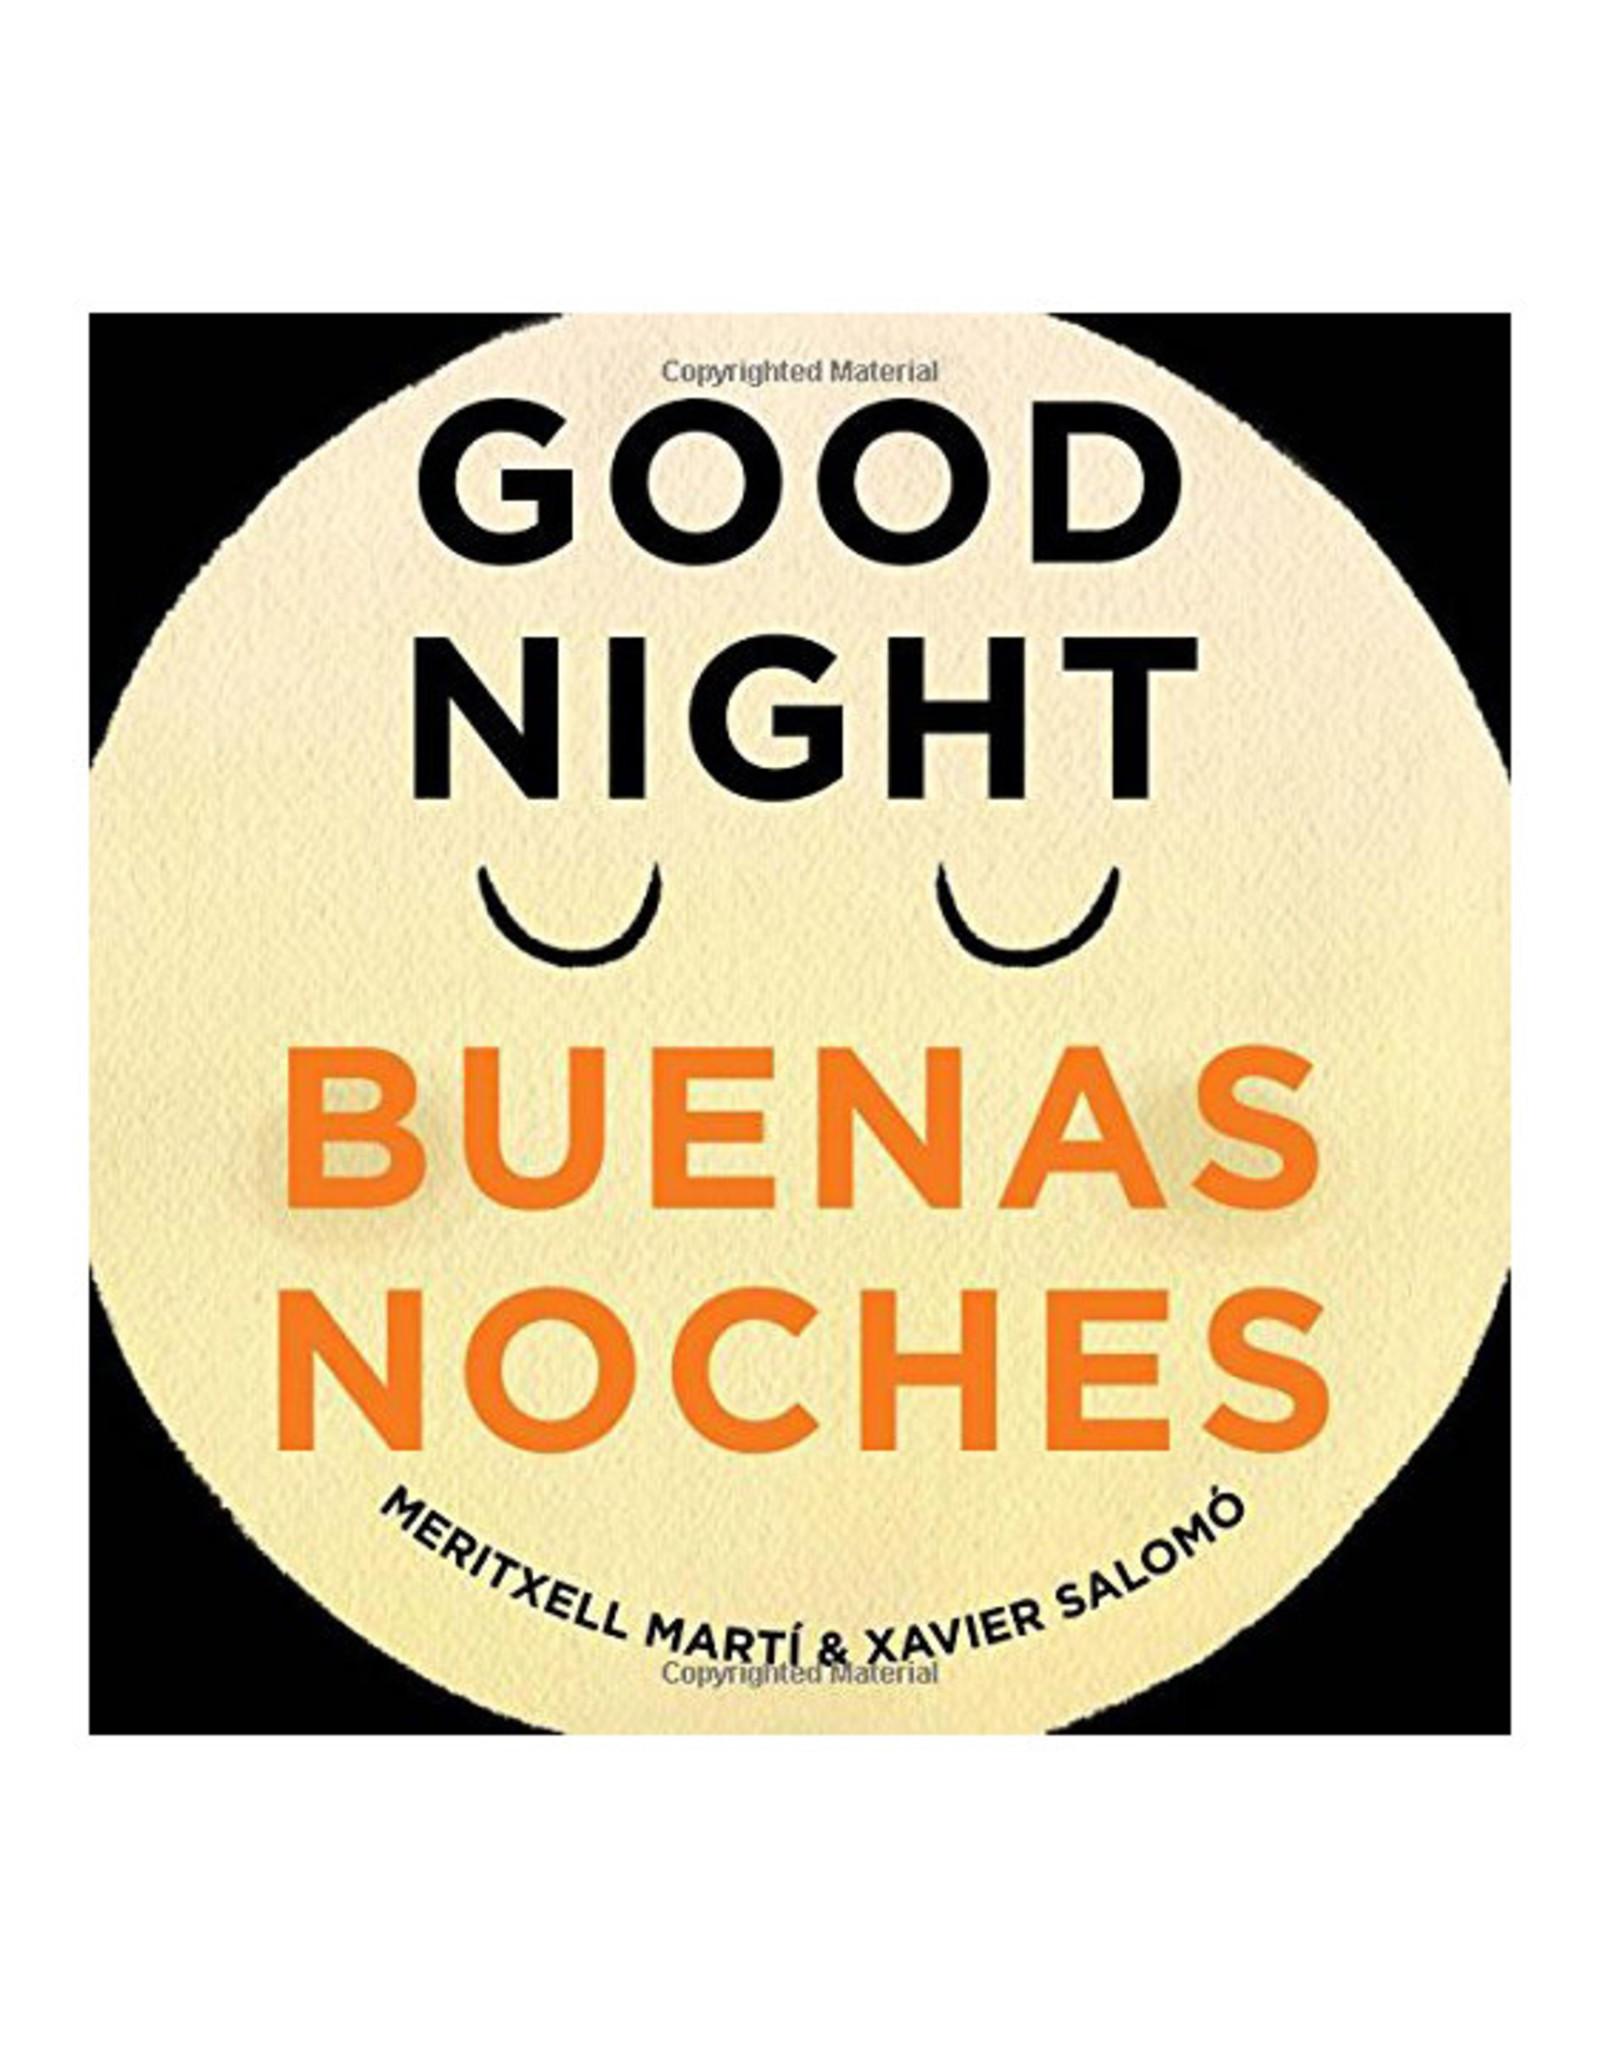 Good Night Buenas Noches